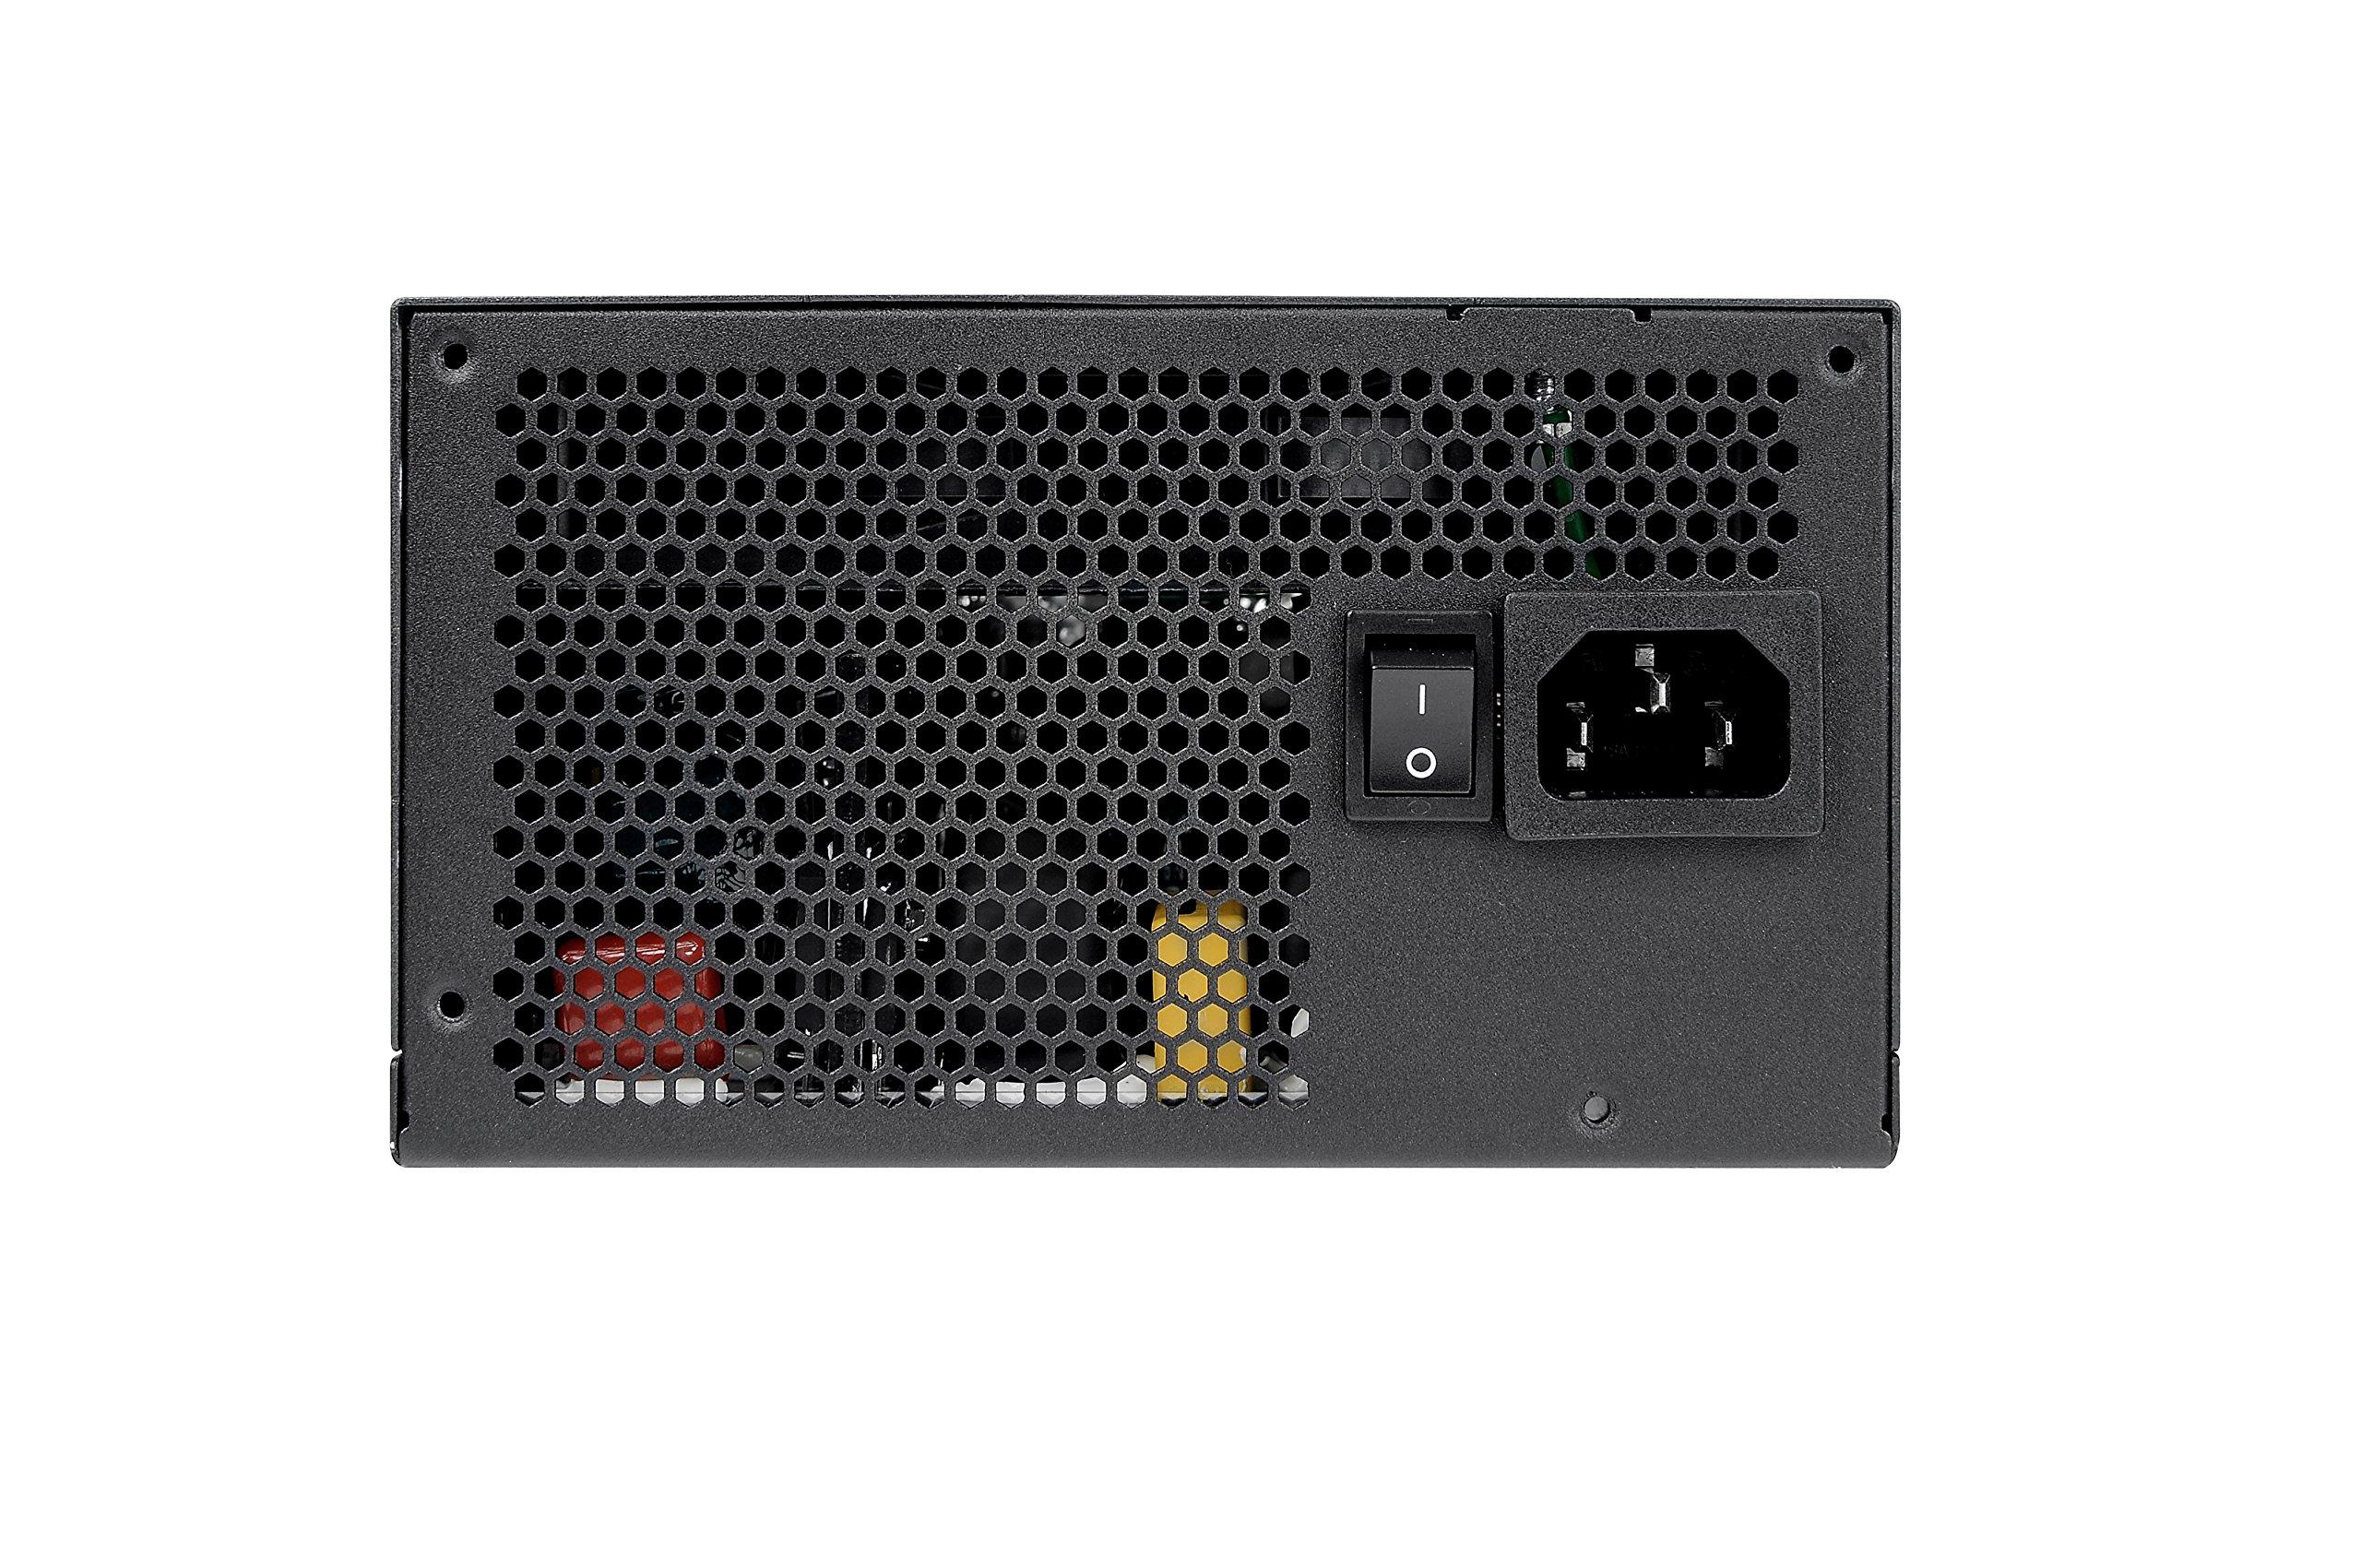 Thermaltake Smart Standard 750W 80 PLUS Bronze ATX12V 2.3 Power Supply SP-750P by Thermaltake (Image #4)